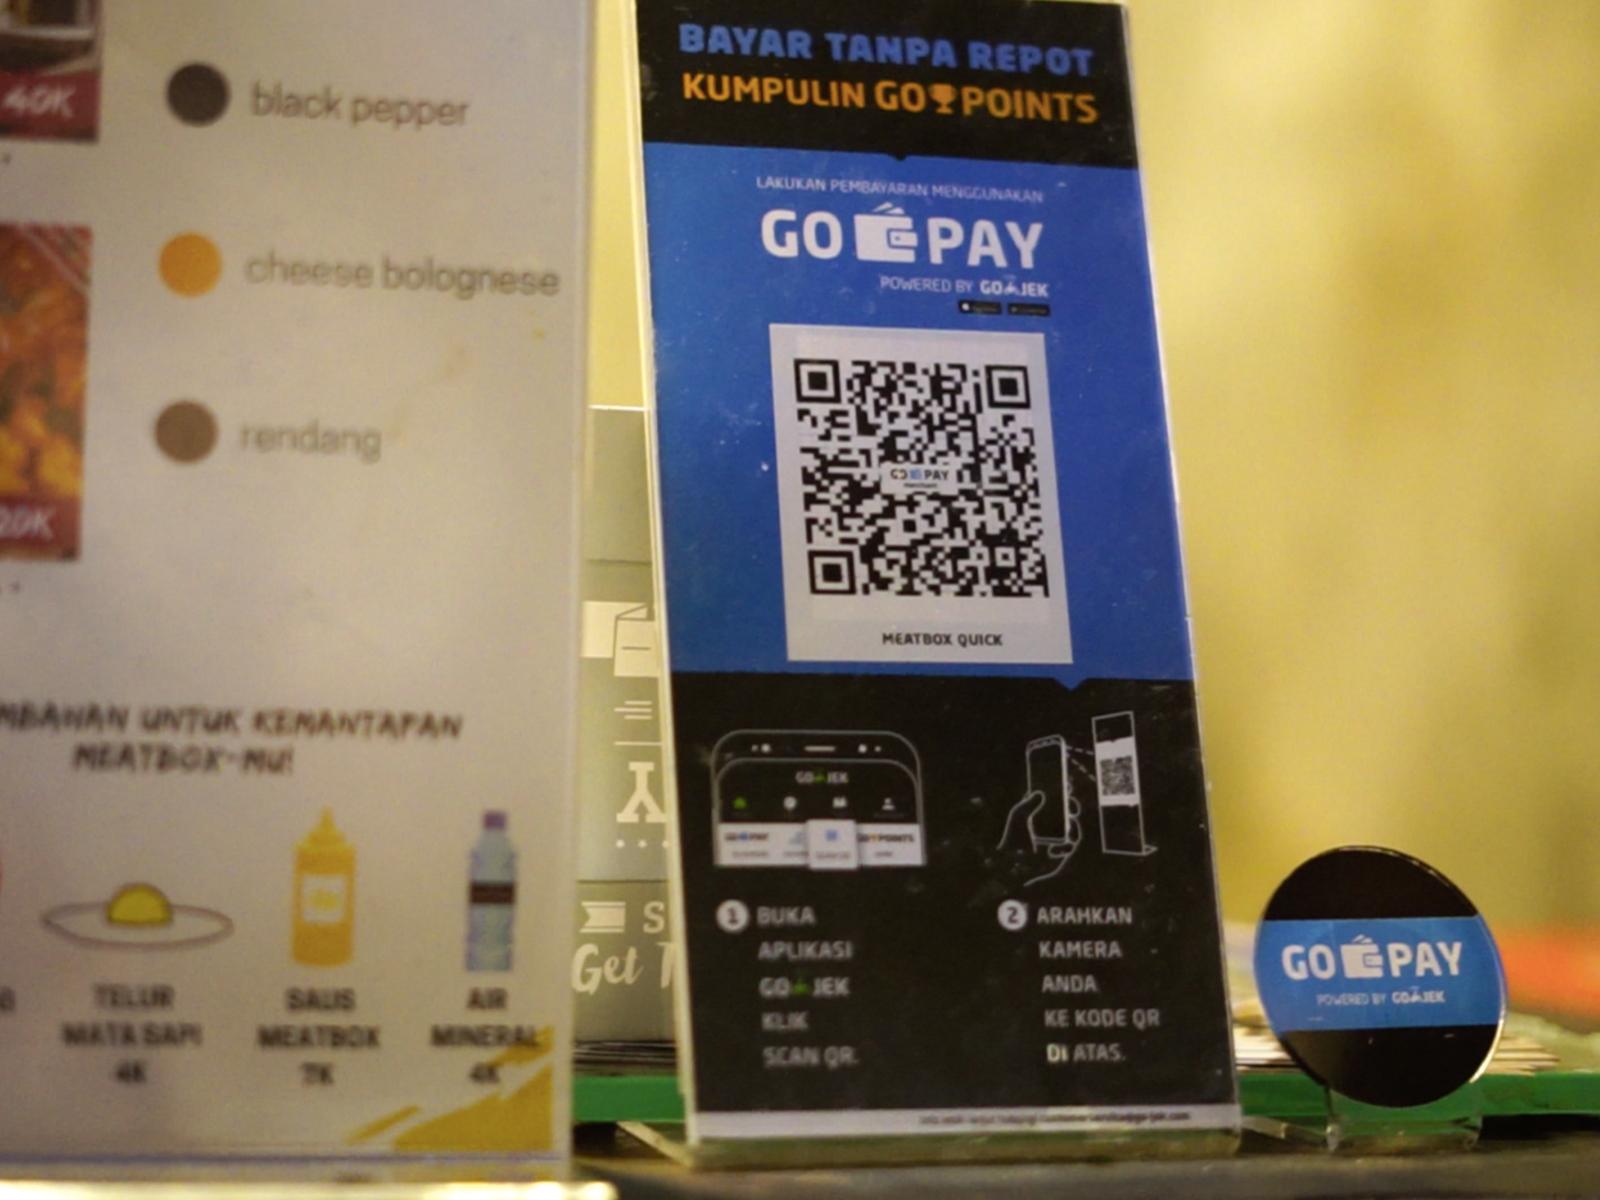 Transaksi Pakai GO-PAY Di Semua Outlet Ranch Market